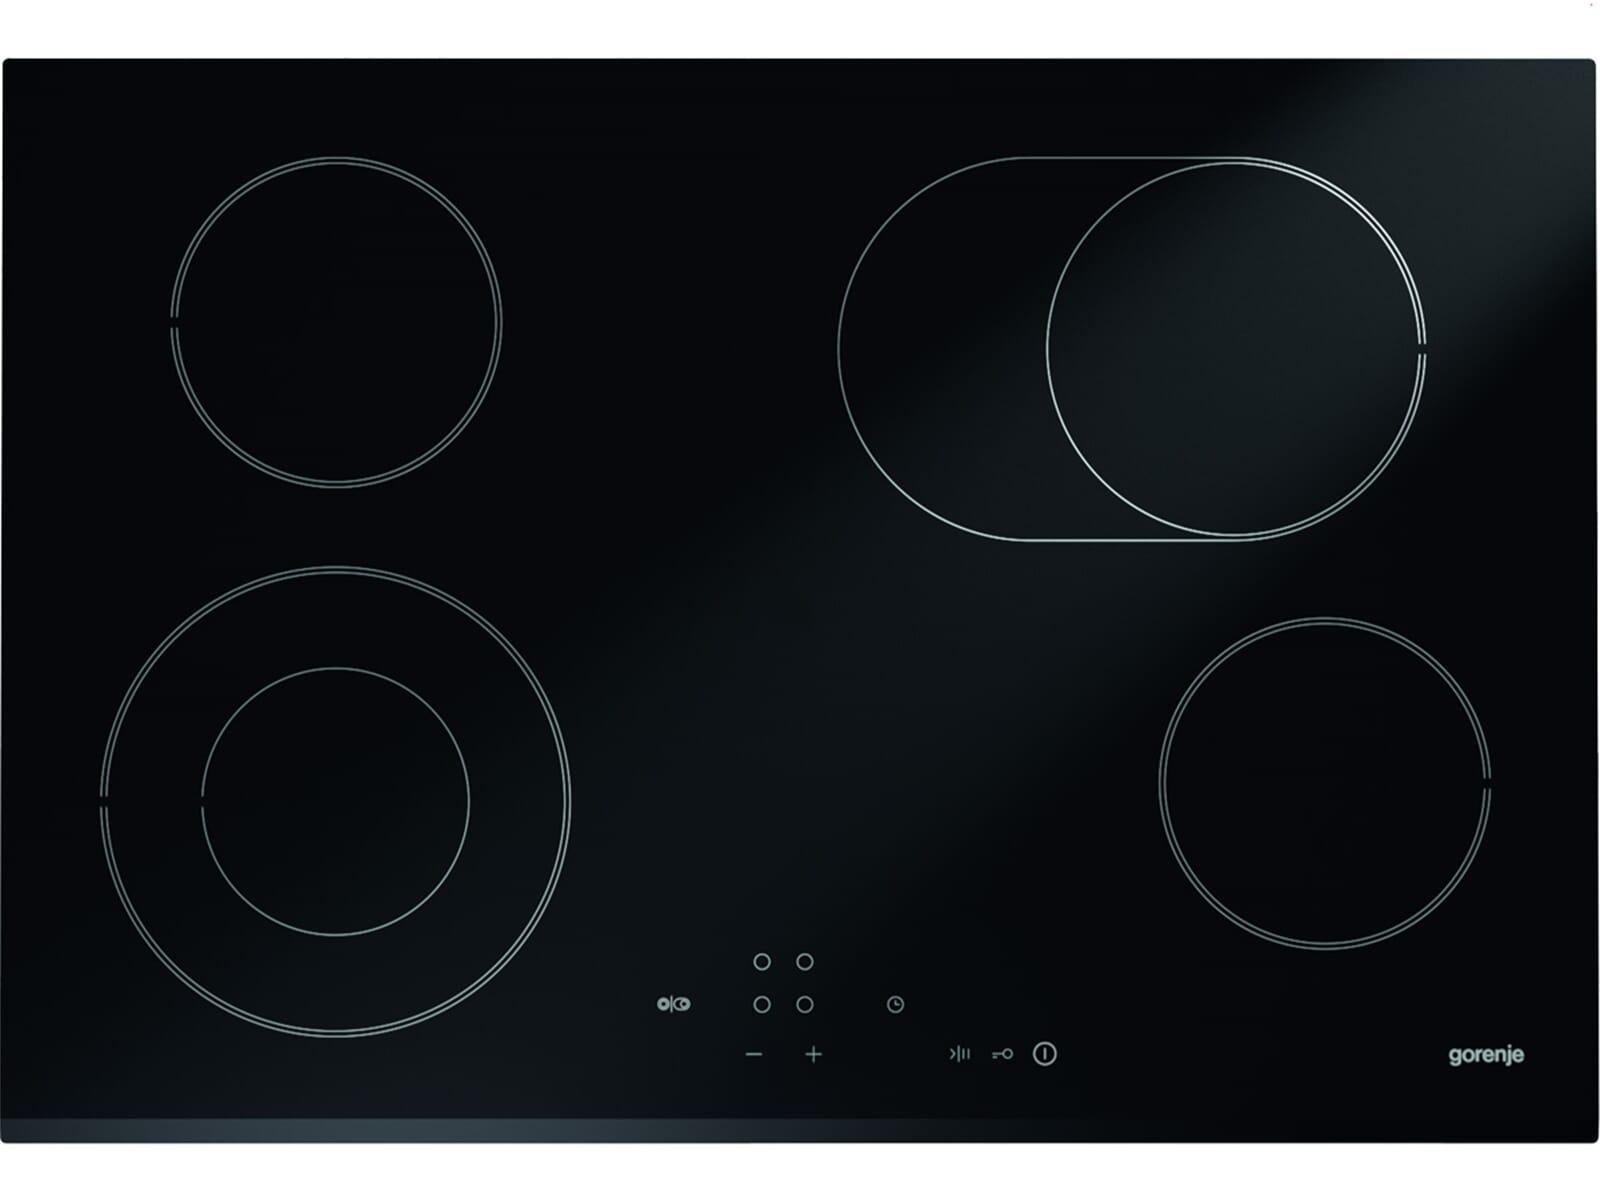 Gorenje Black Pepper Set A06 Backofen BO 647 A20XG + Glaskeramikkochfeld ECT 720 CSC